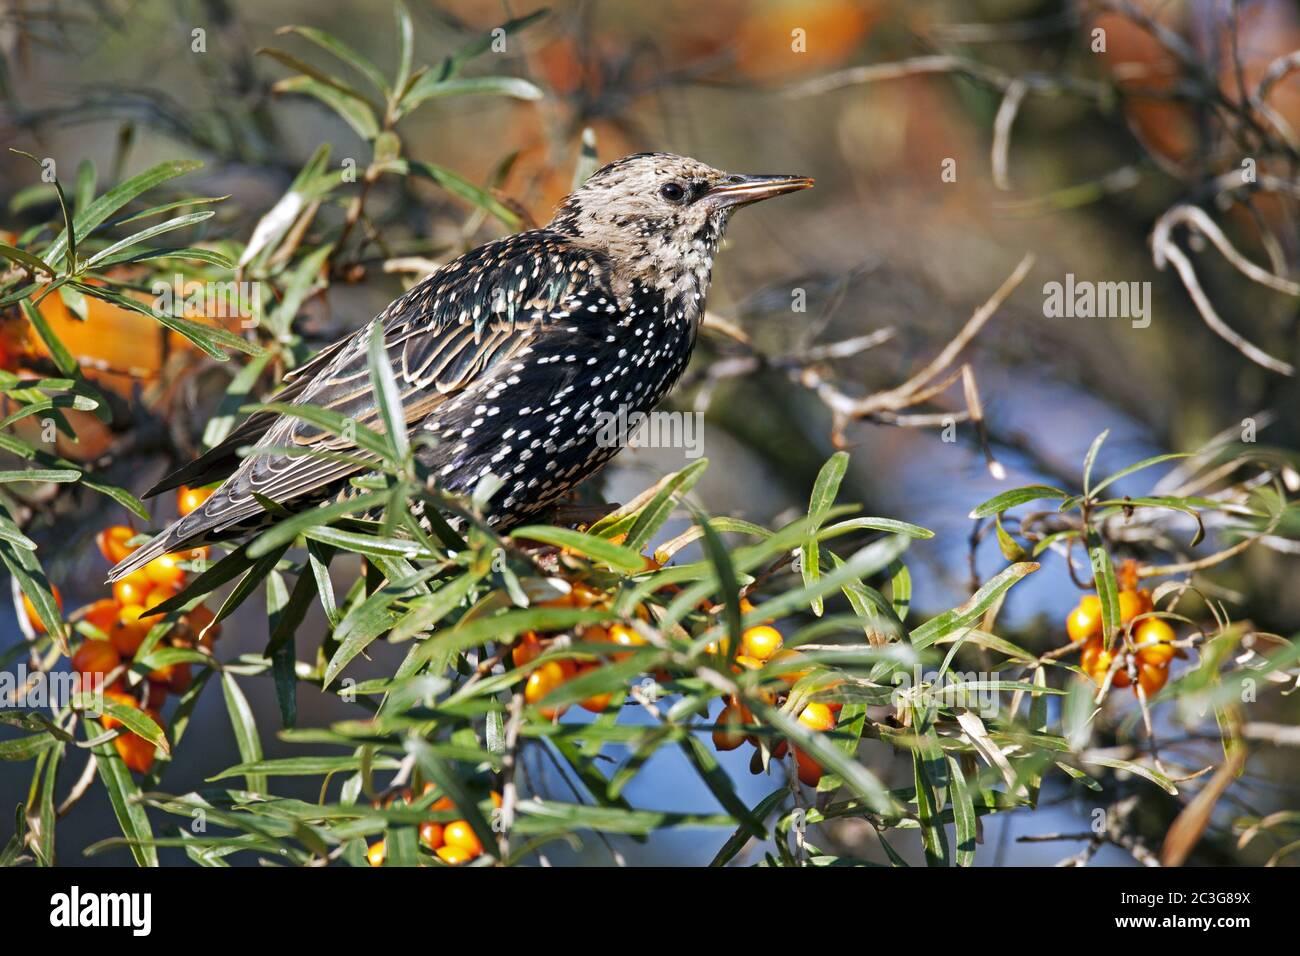 Starling juvenile bird / Sturnus vulgaris Stock Photo